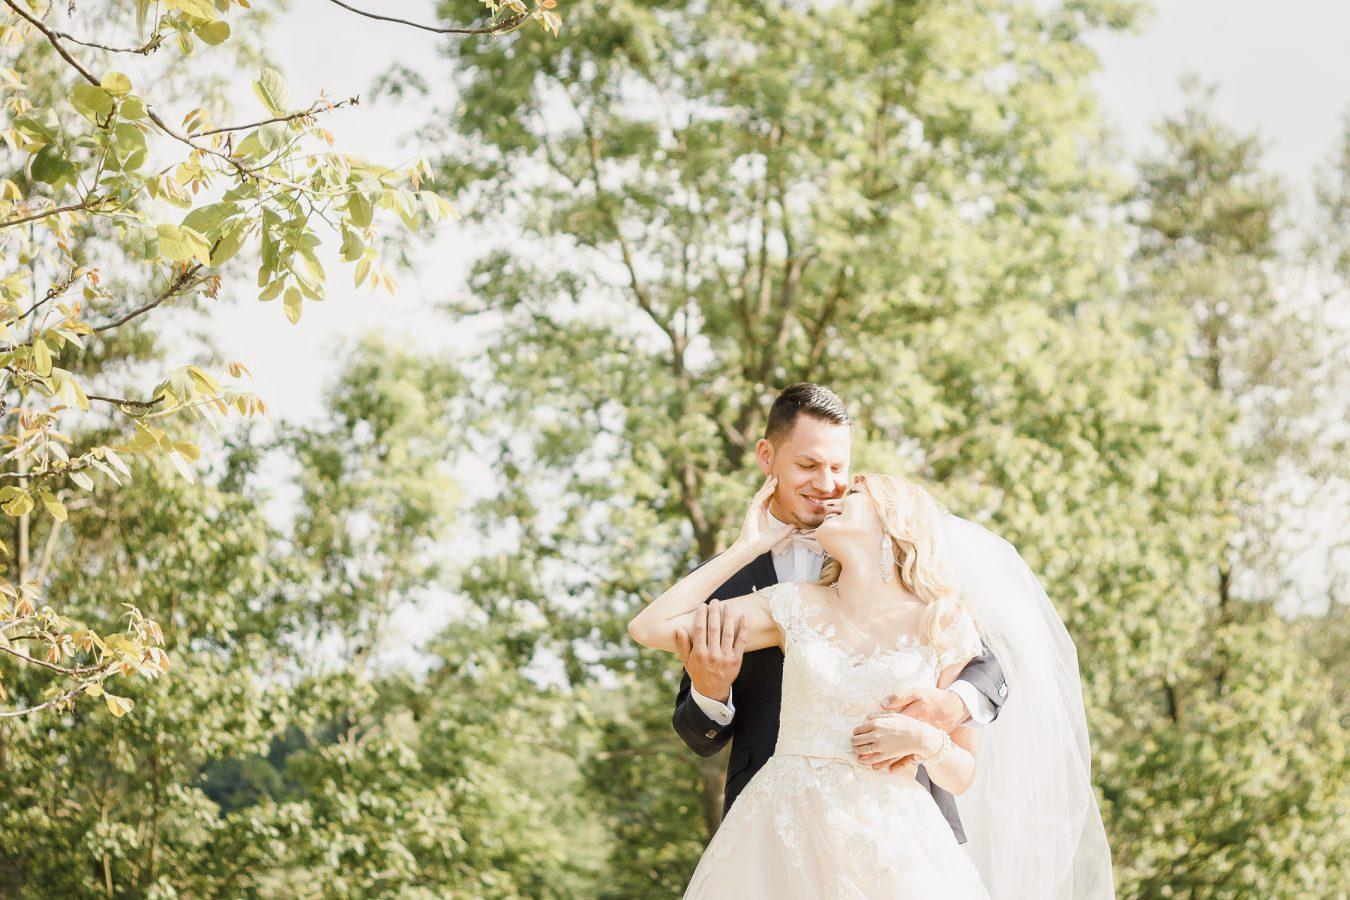 Romantic wedding photoshoot in beautiful Slovakia